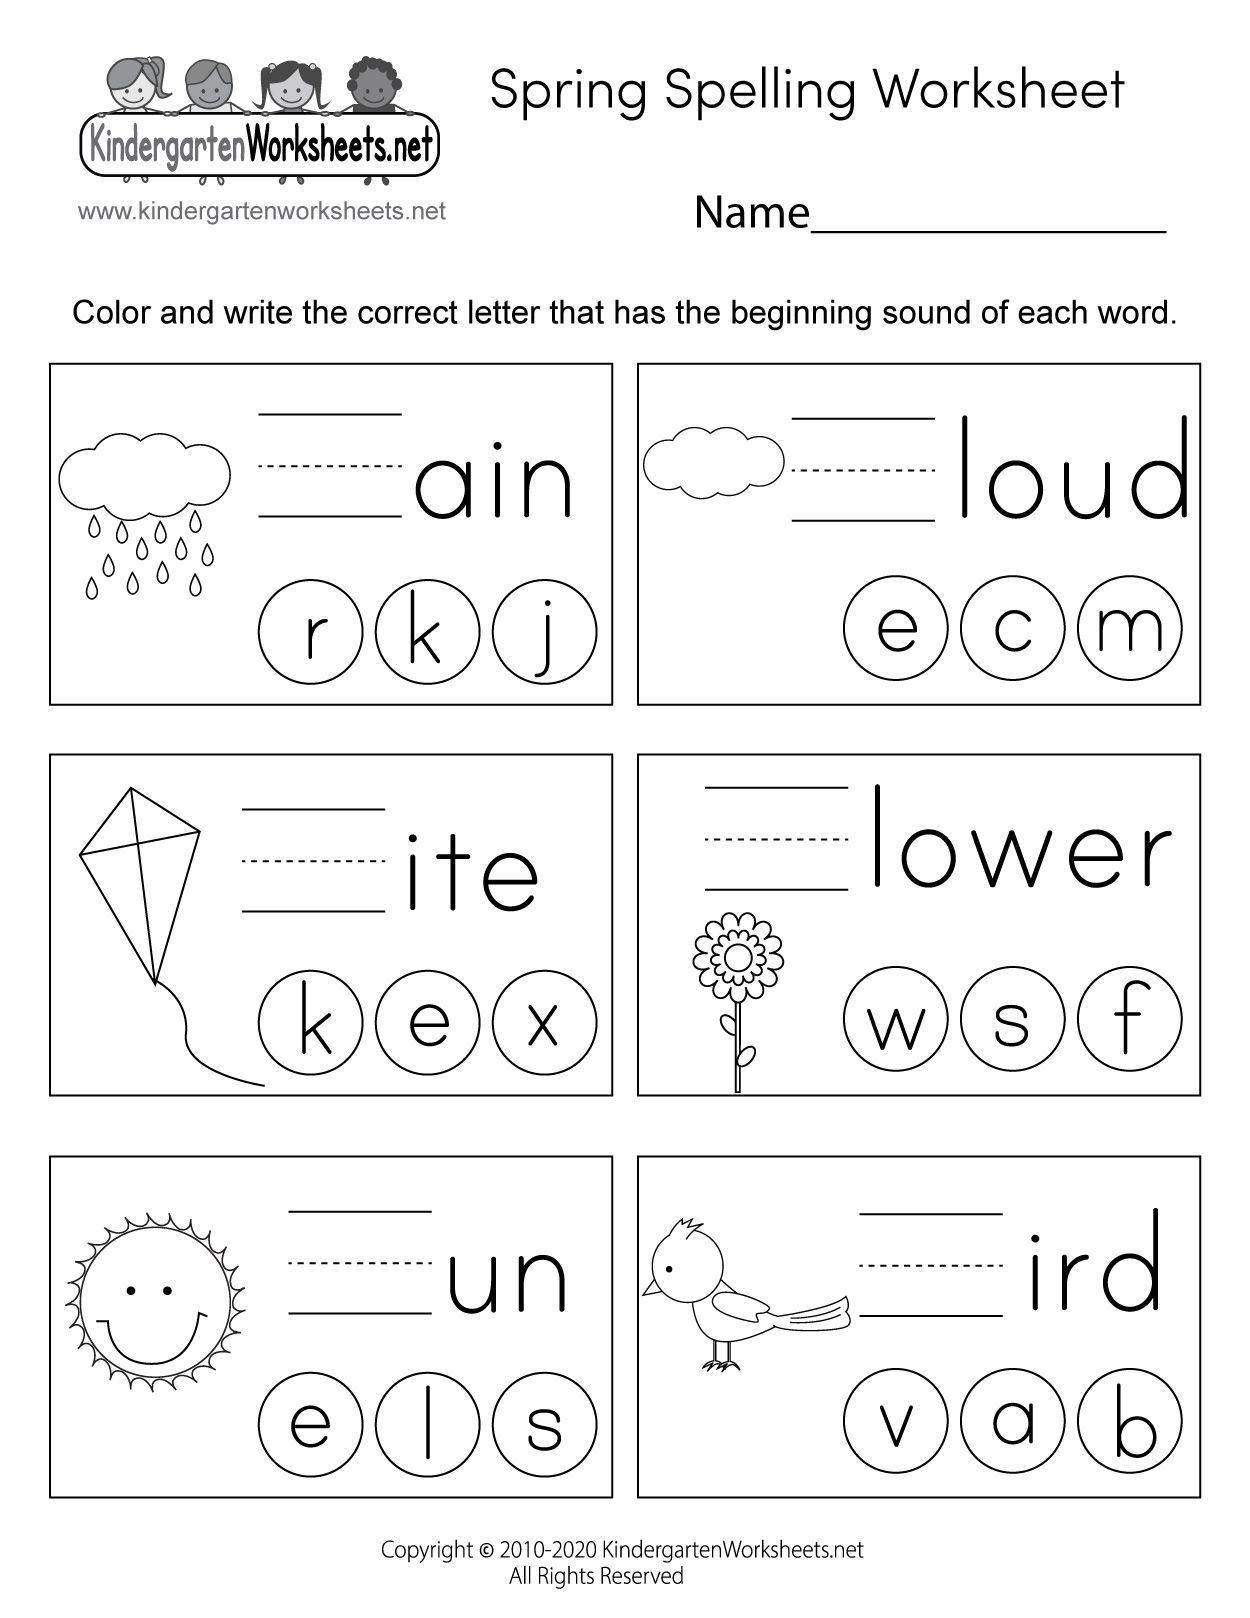 Kindergarten Spring Spelling Worksheet In 2021 Kindergarten Spring Math Worksheets Spring Math Worksheets Free Kindergarten Worksheets